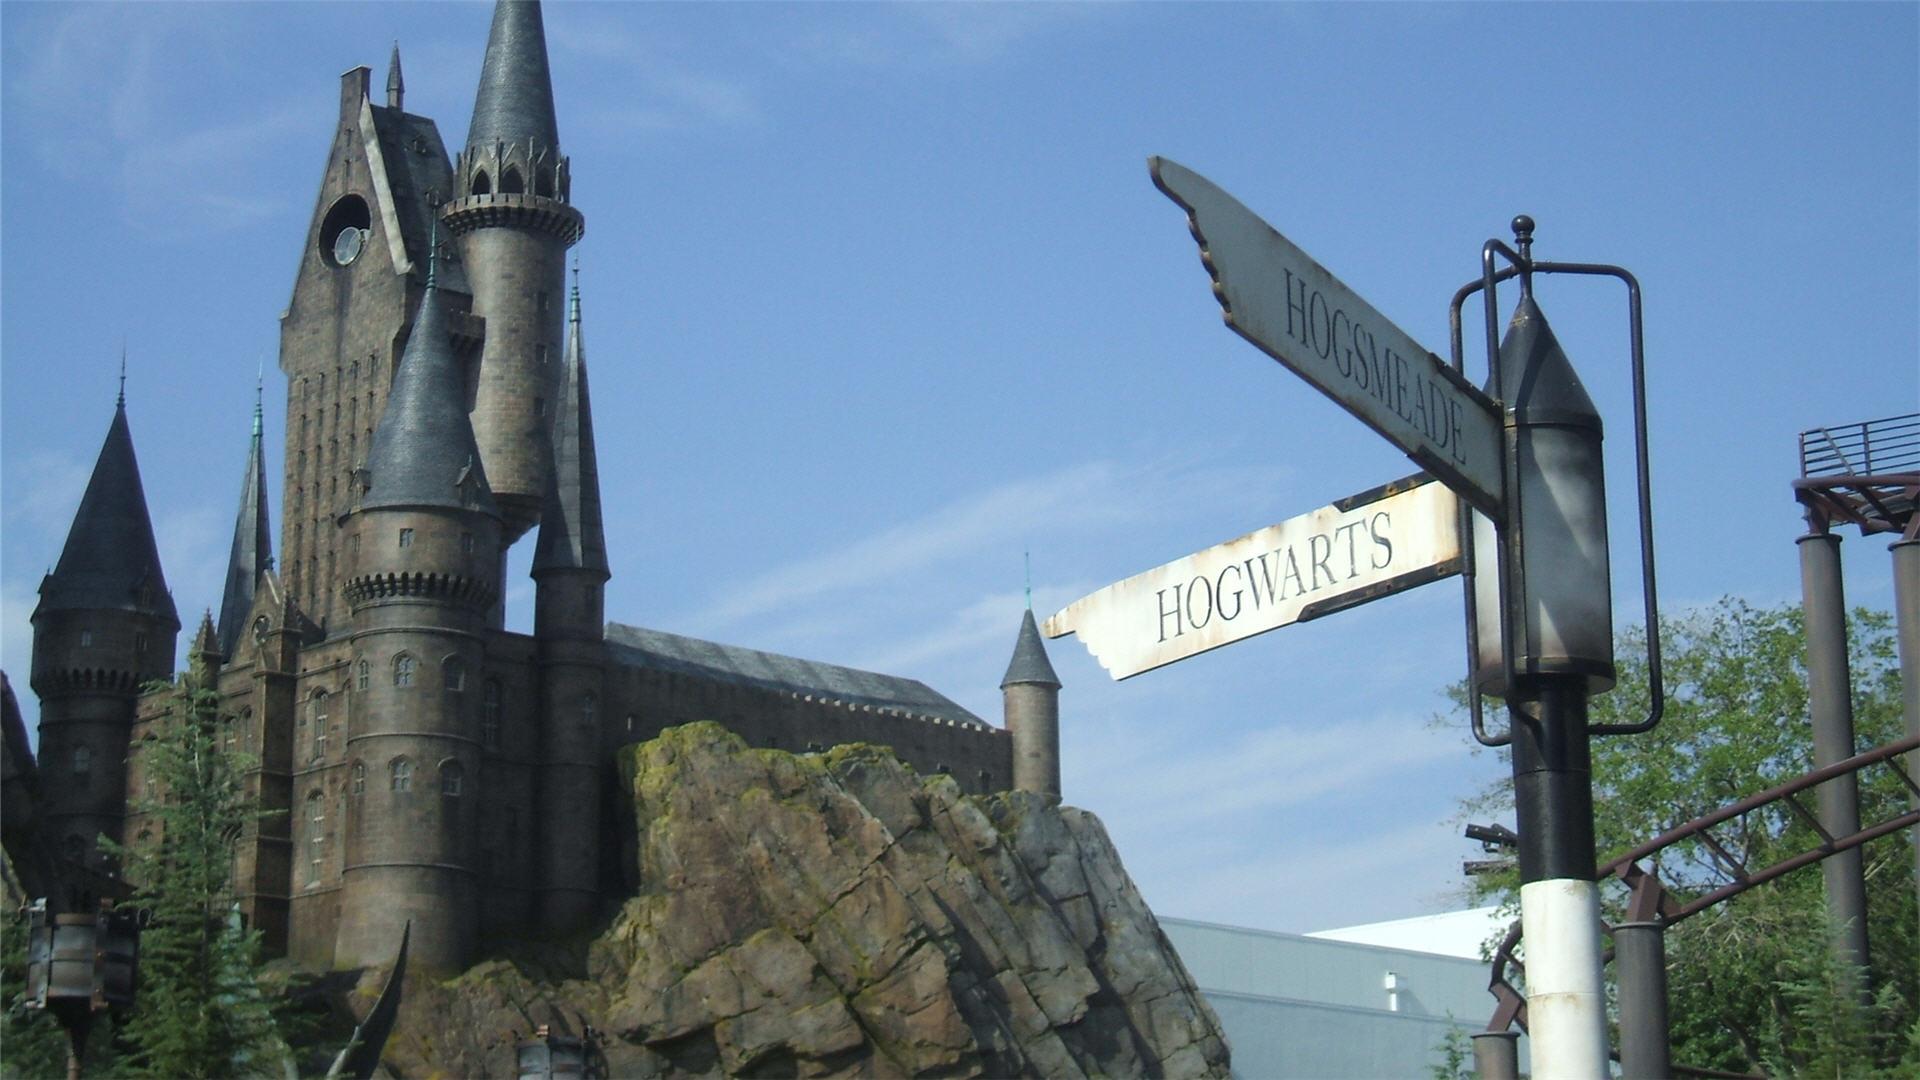 Inspirational Quotes Iphone Wallpaper Hd Hogwarts Castle Wallpapers Hd Pixelstalk Net